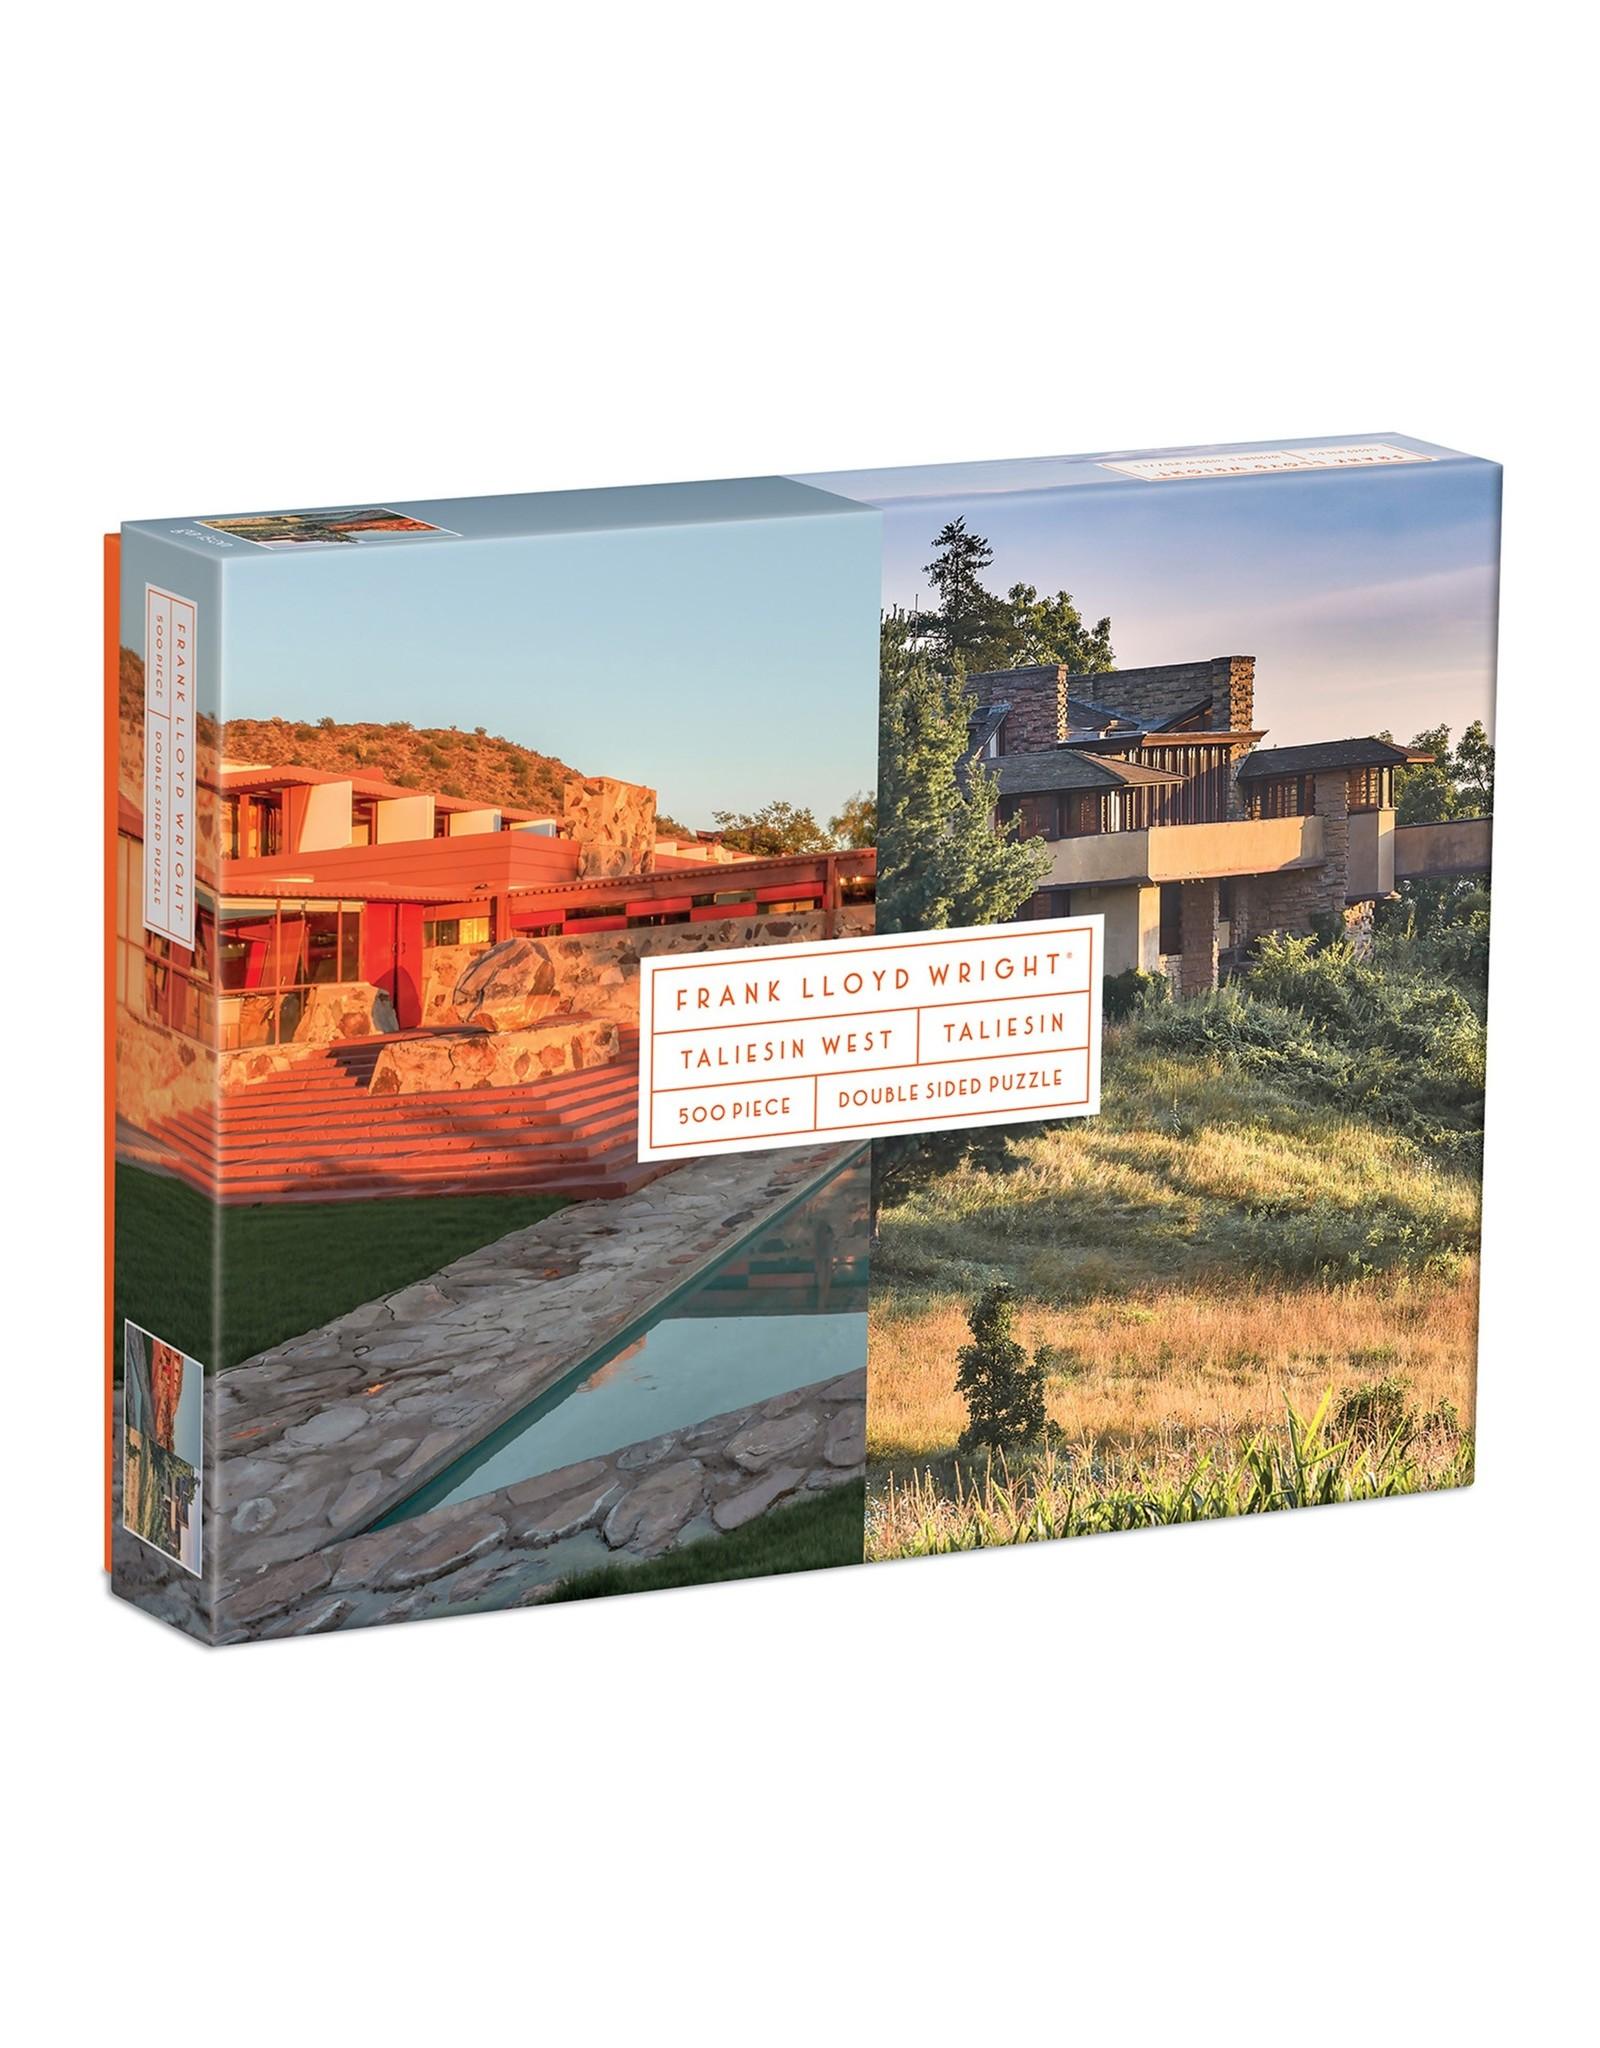 Galison Frank Lloyd Wright Taliesin West/Taliesin 500 piece puzzle